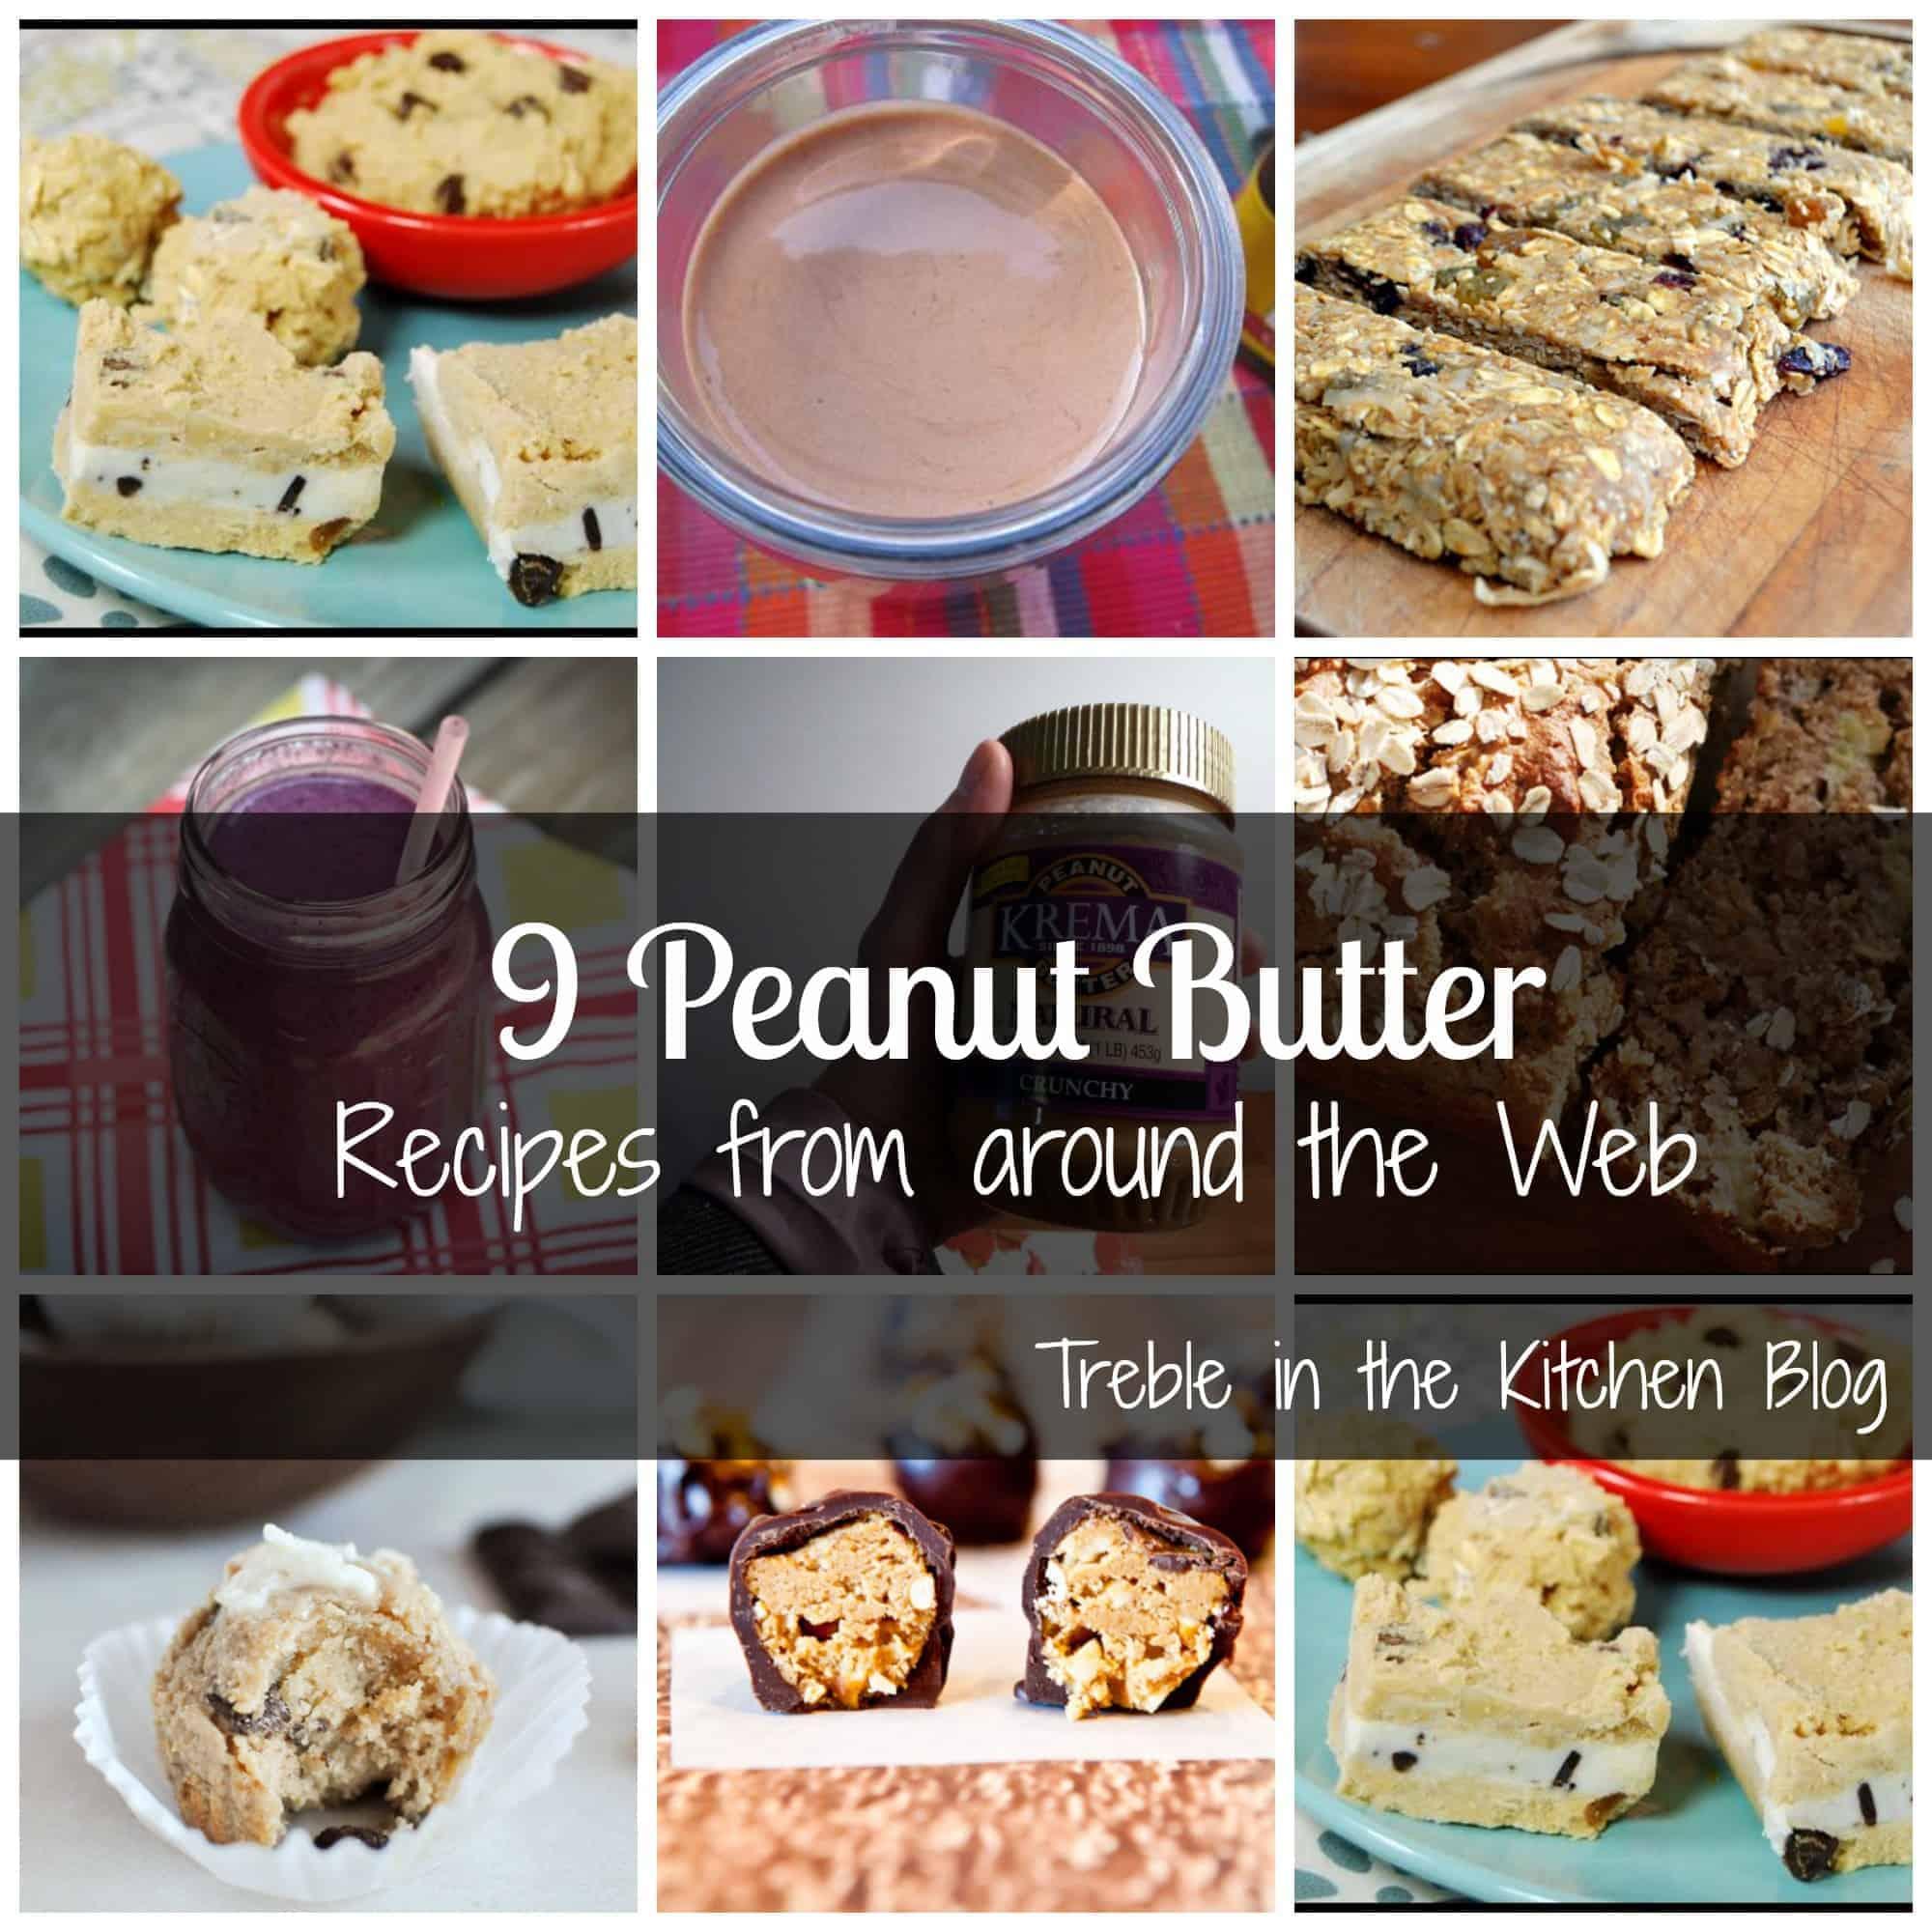 peanut butter recipe roundup text